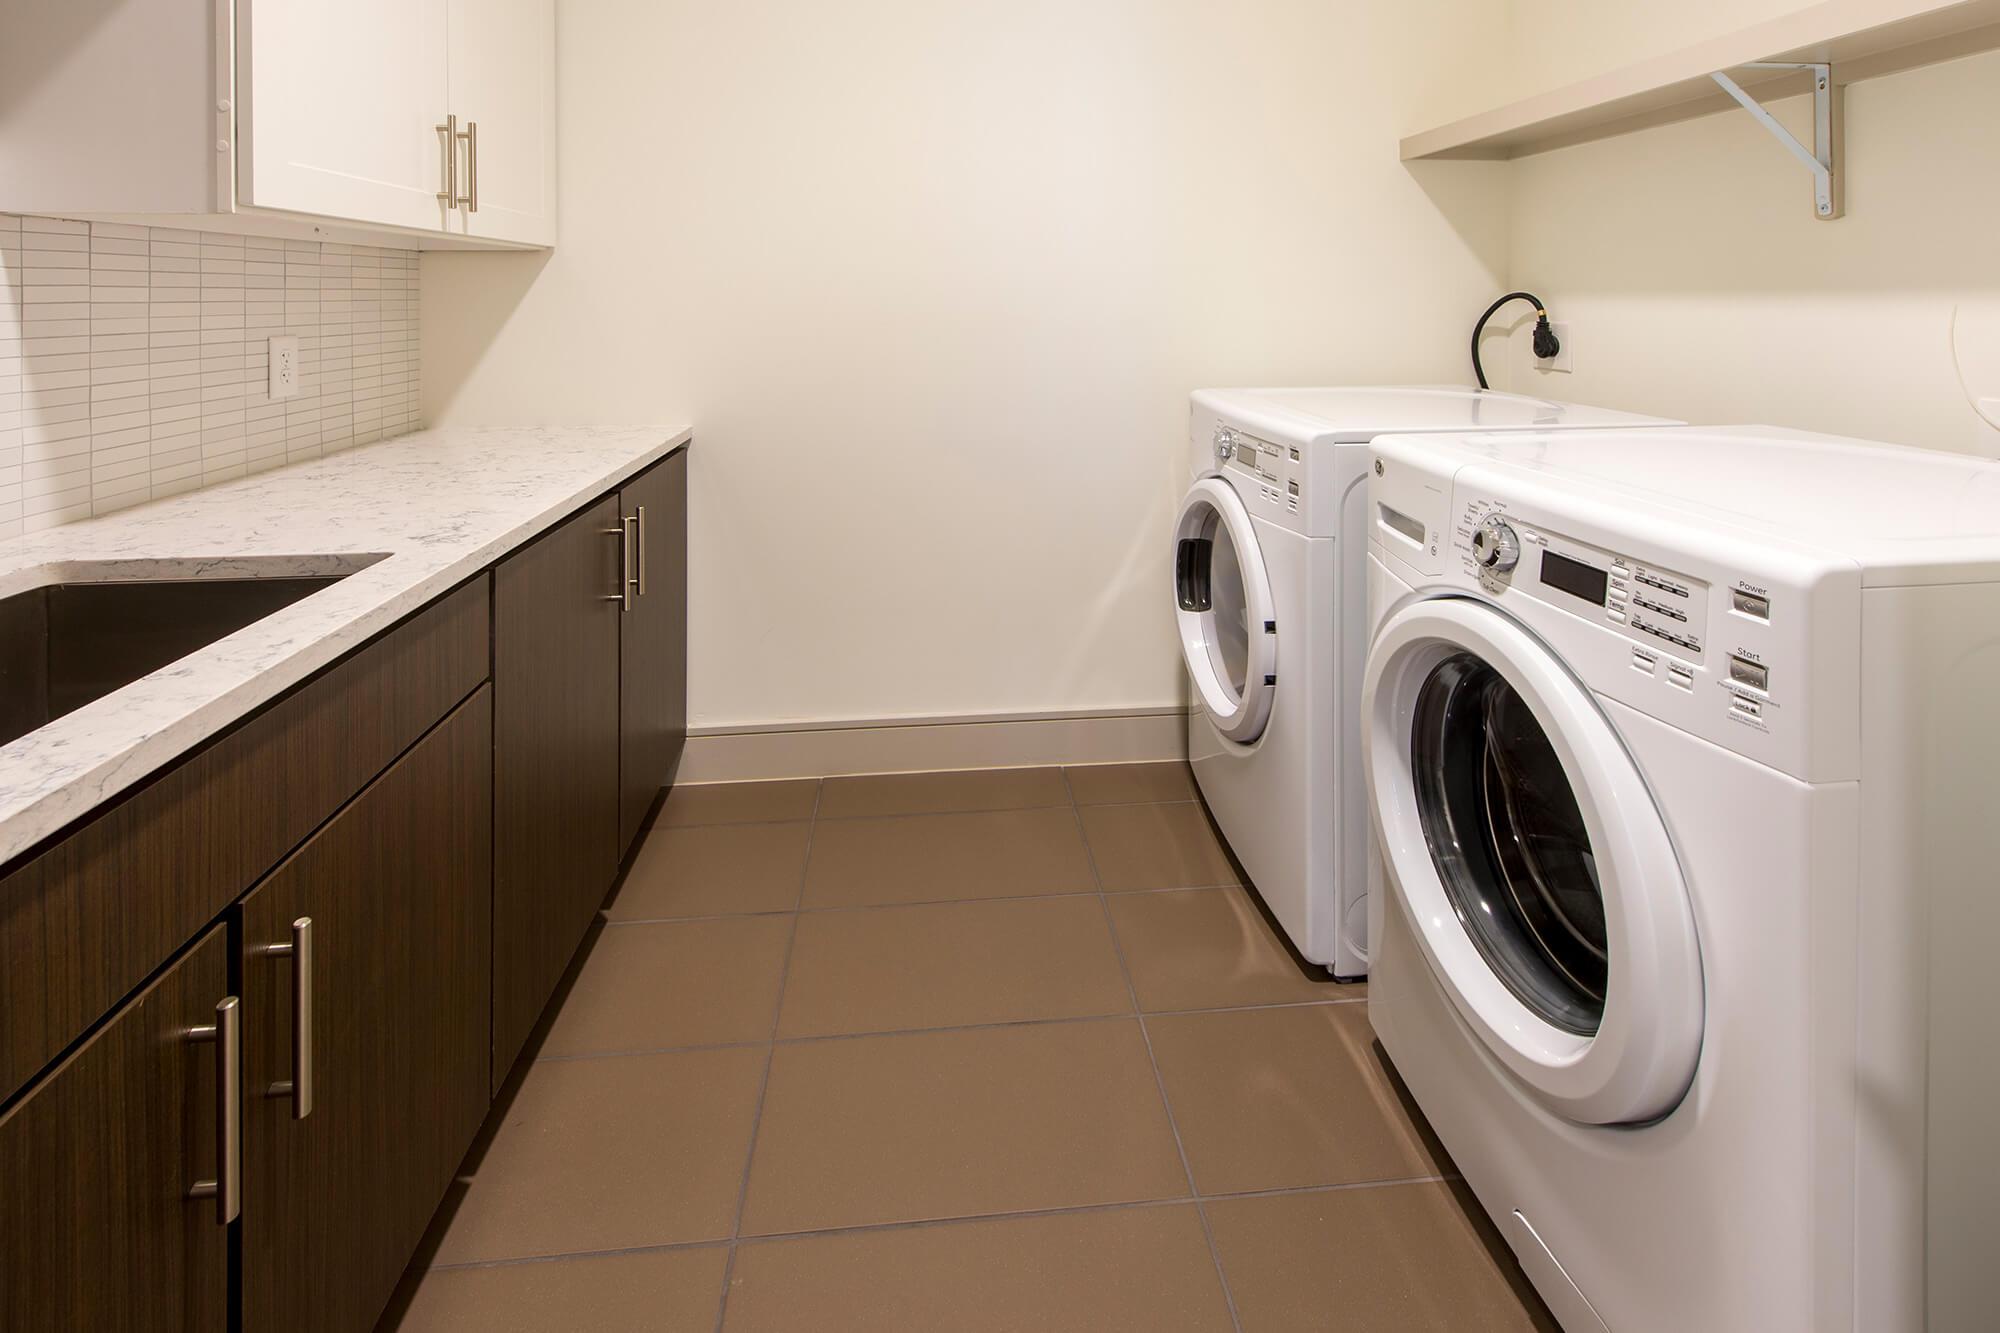 Latitude Med Center Plan P4: Laundry